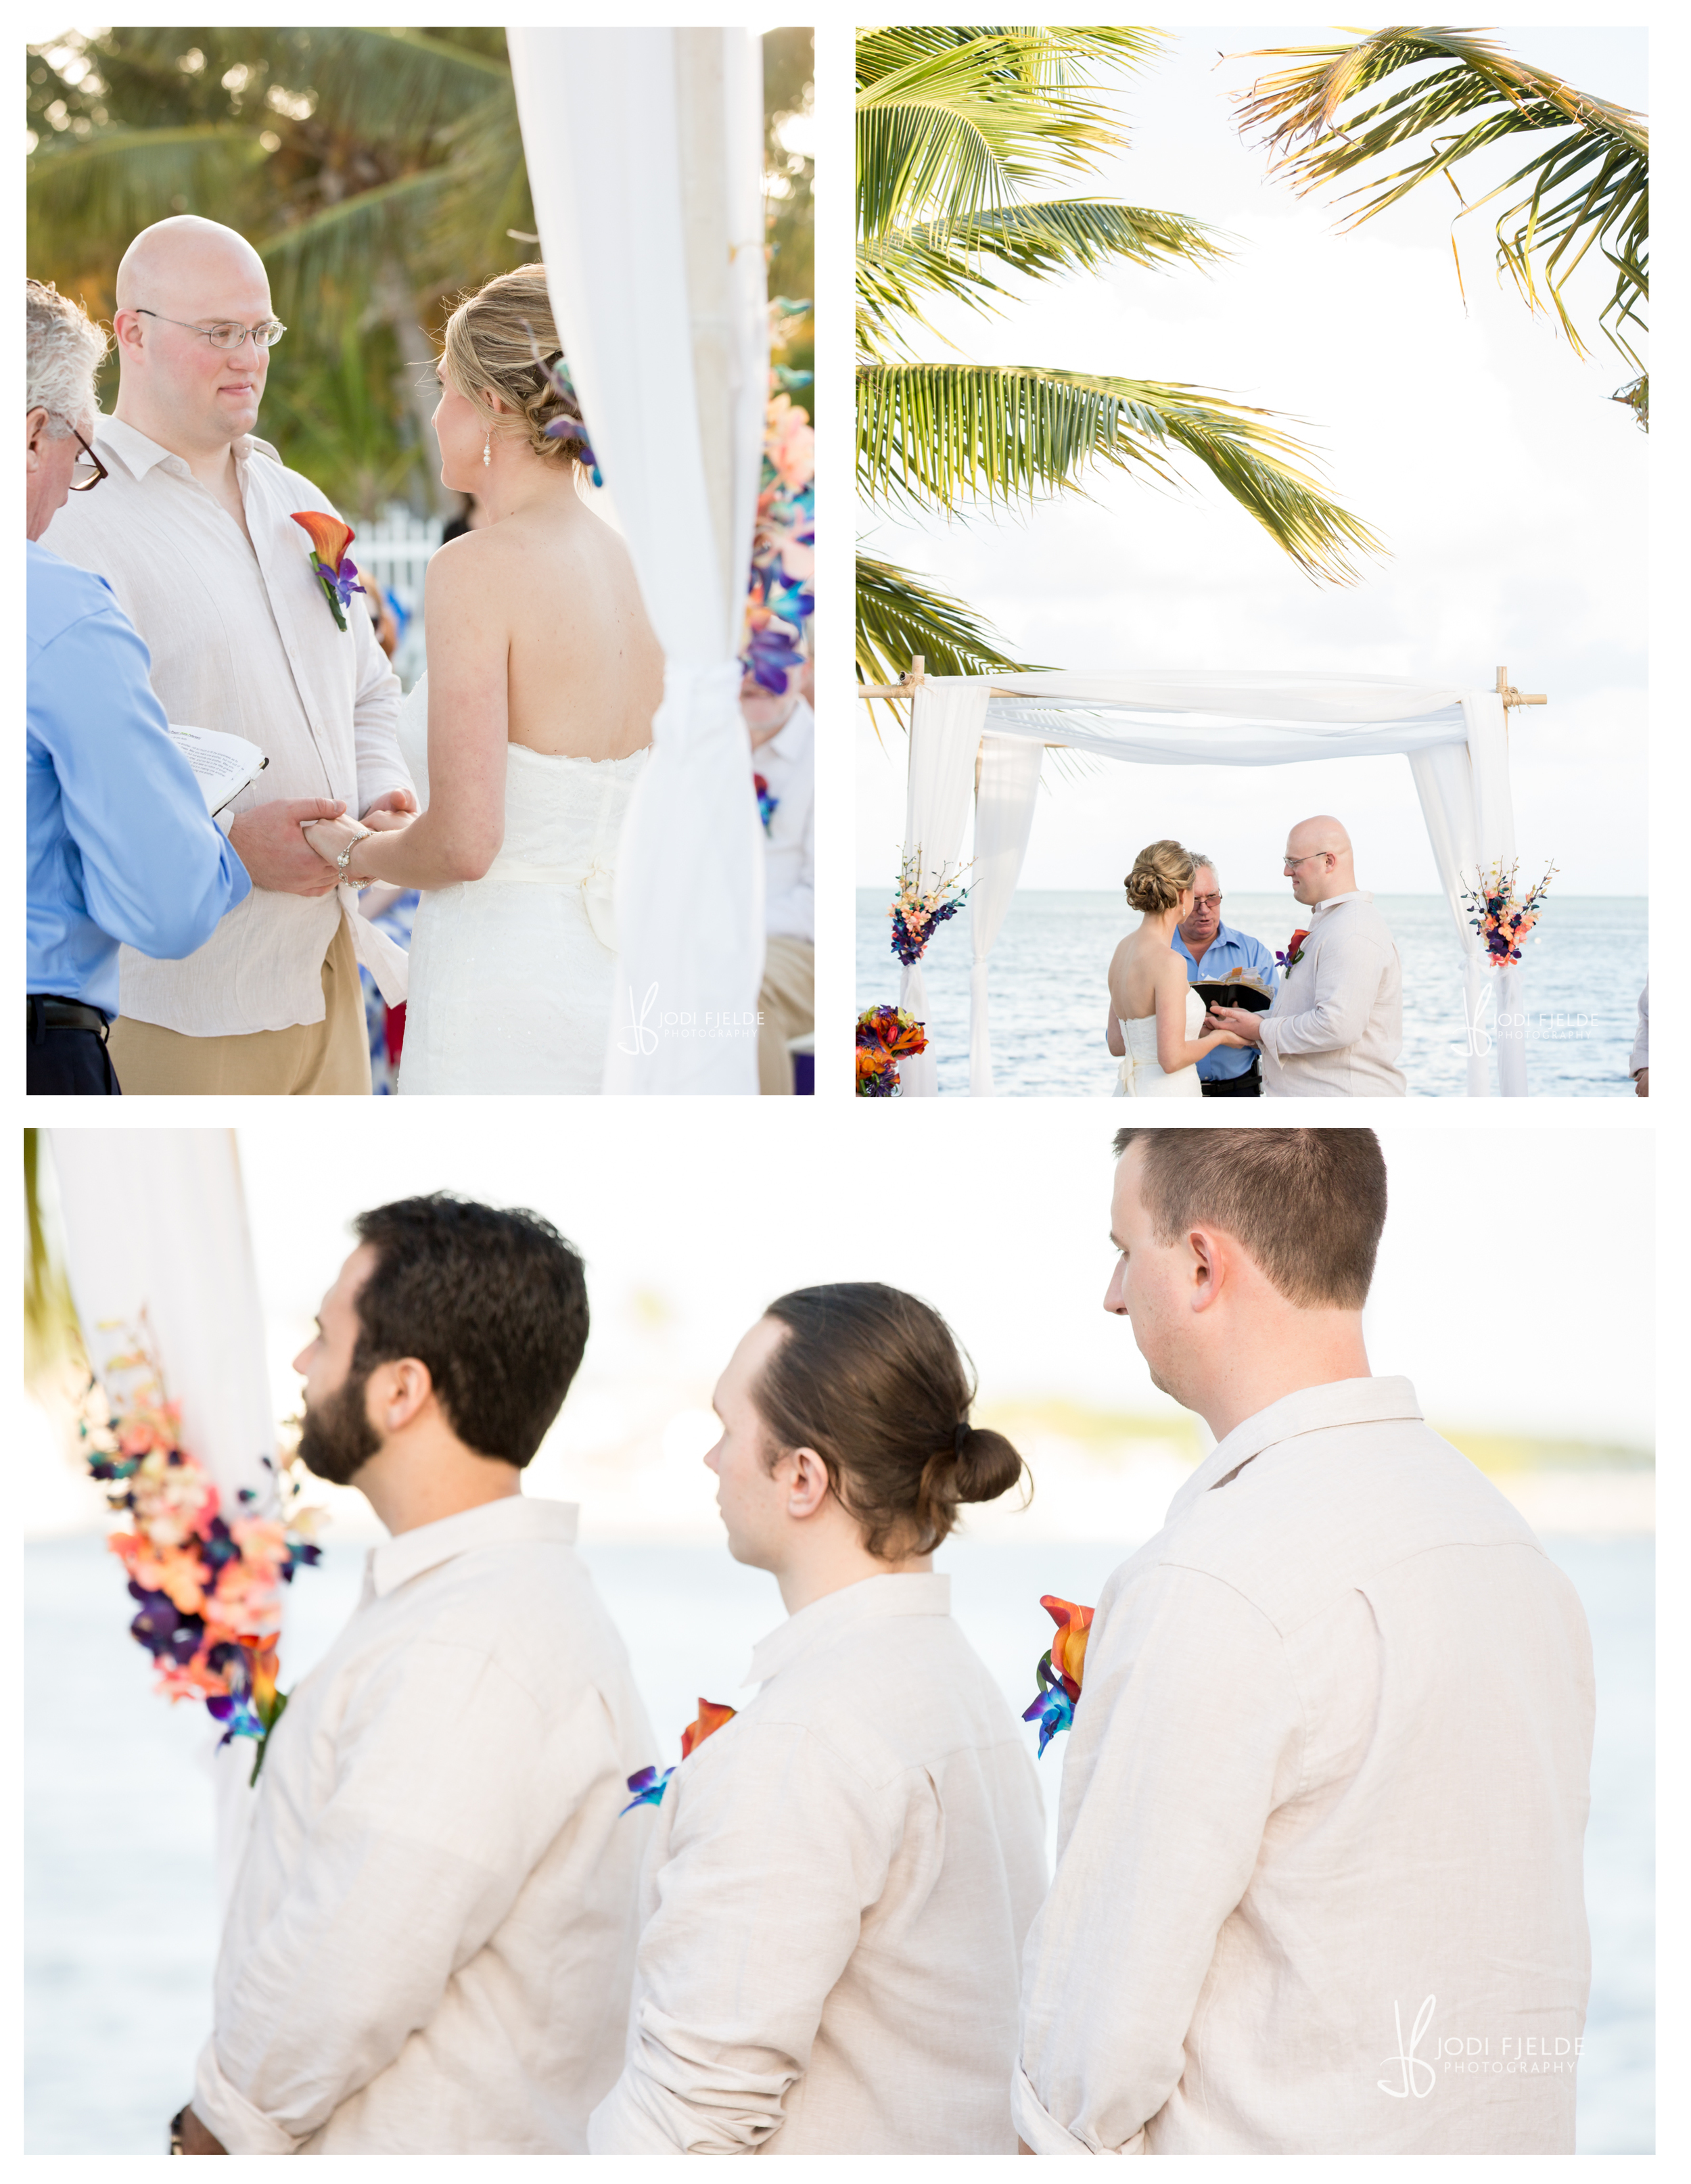 Cocconut_Cove_&_ Marina_ wedding_Kayla_and_Patrick 18.jpg